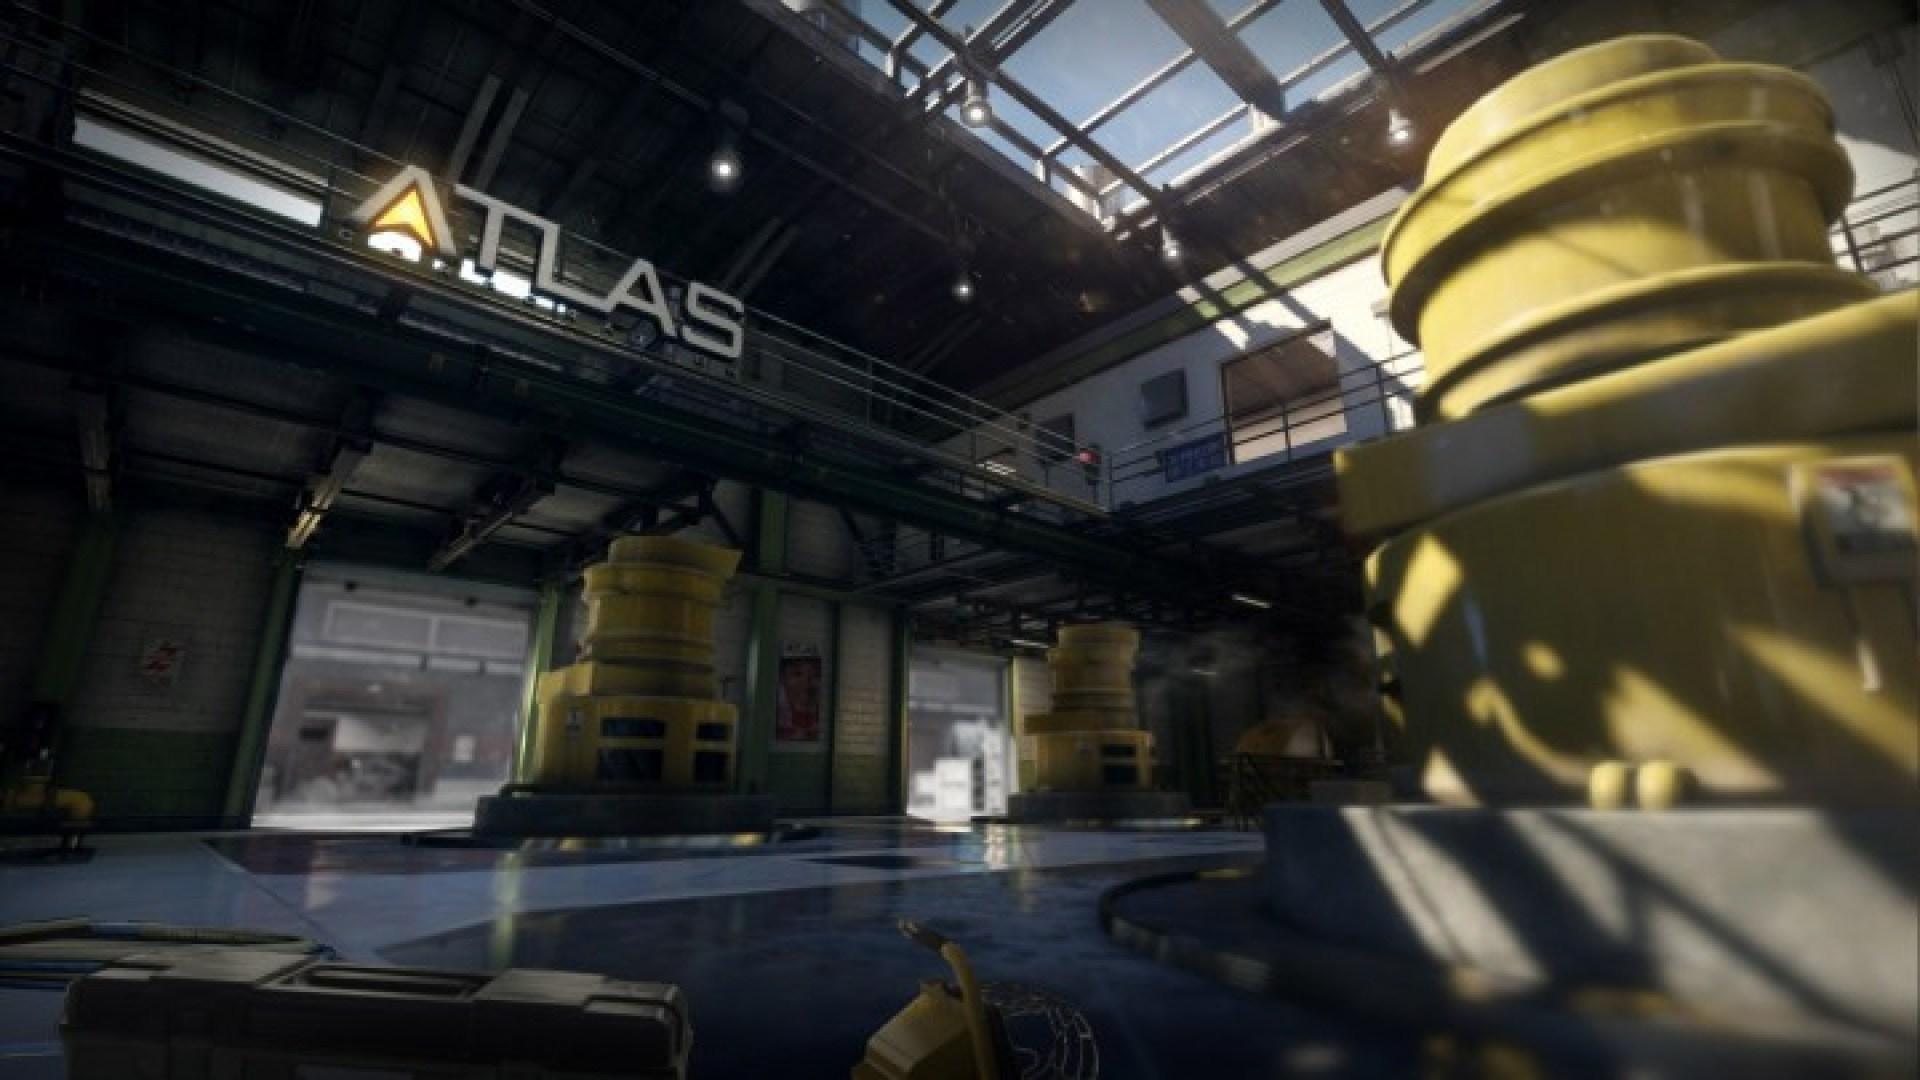 『Call of Duty: Advanced Warfare(コール オブ デューティ アドバンスド・ウォーフェア)』Atlas Gorge